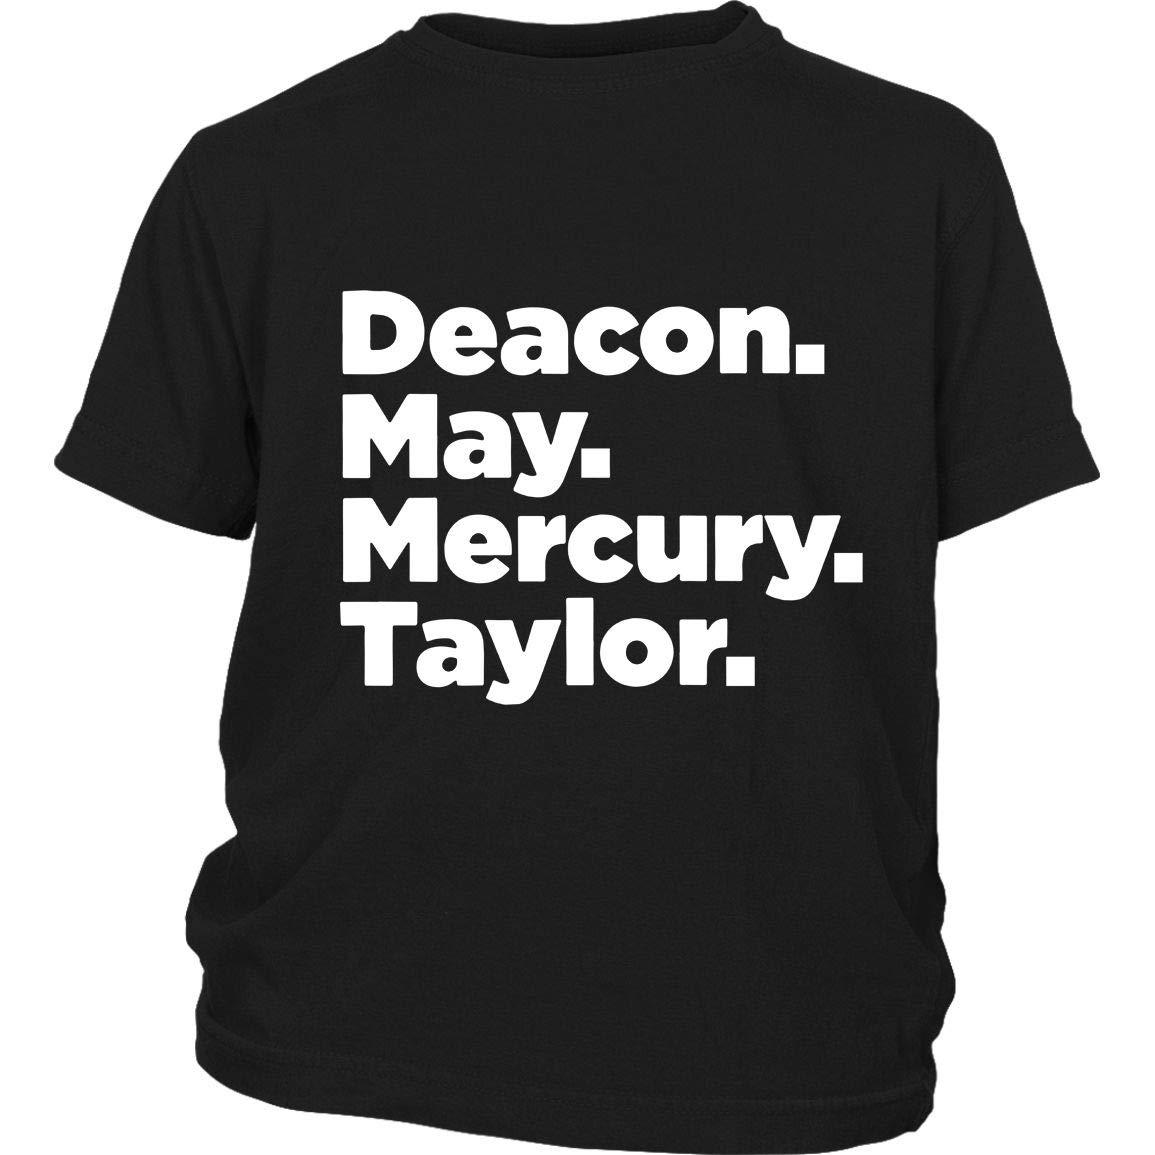 Deacon May Mercury Taylor T Shirt Queen Members T Shirt T Shirt 4758